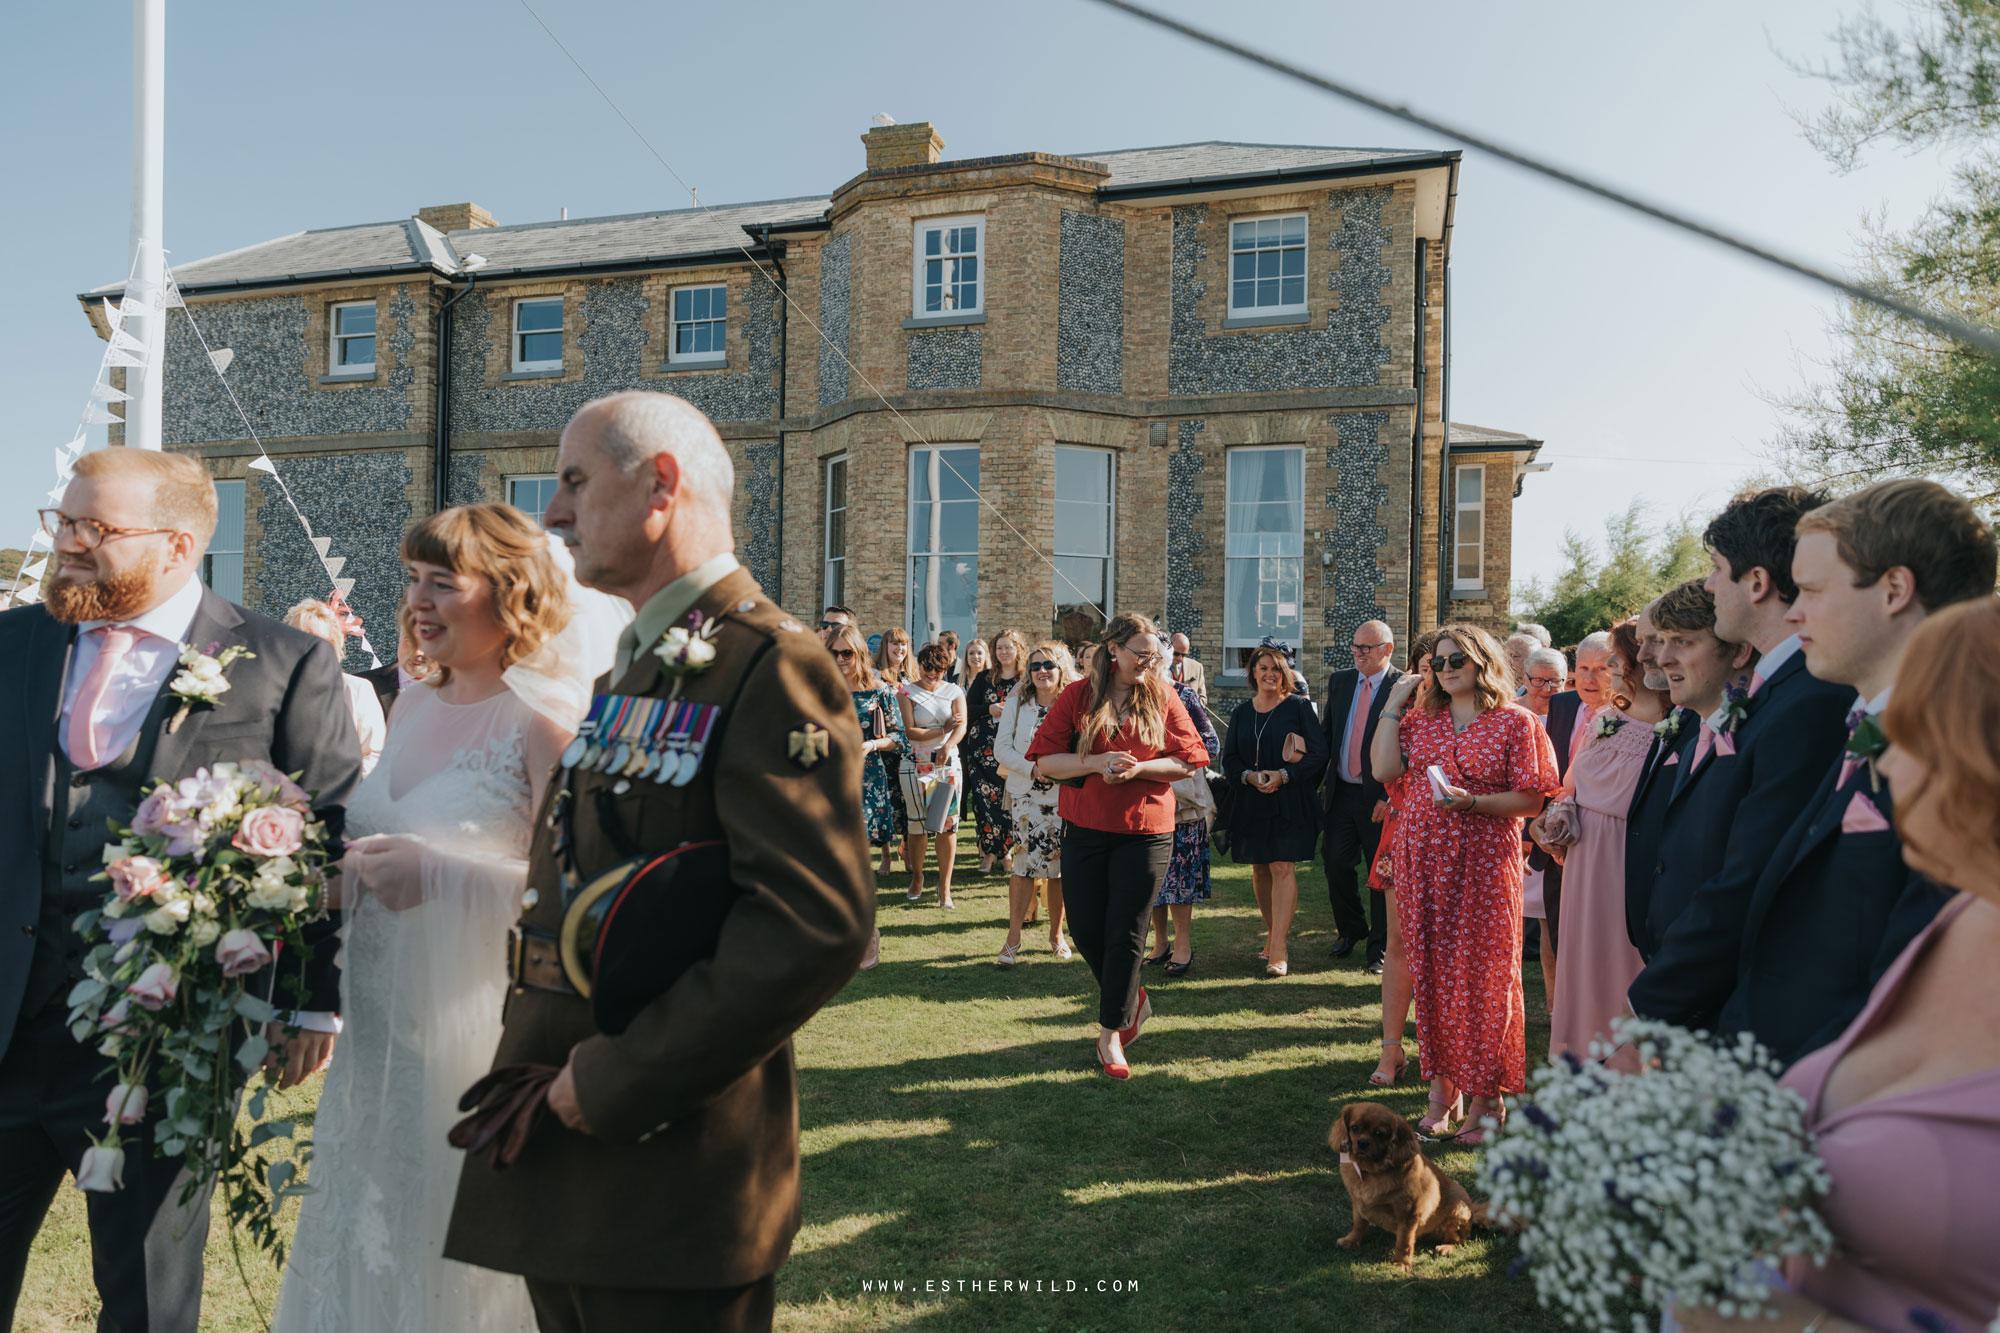 Cromer_Wedding_Beach_Outdoor_Ceremony_Norfolk_North_Lodge_Registry_Office_Rocket_House_Cafe_Cromer_Pier_IMG_3723.jpg